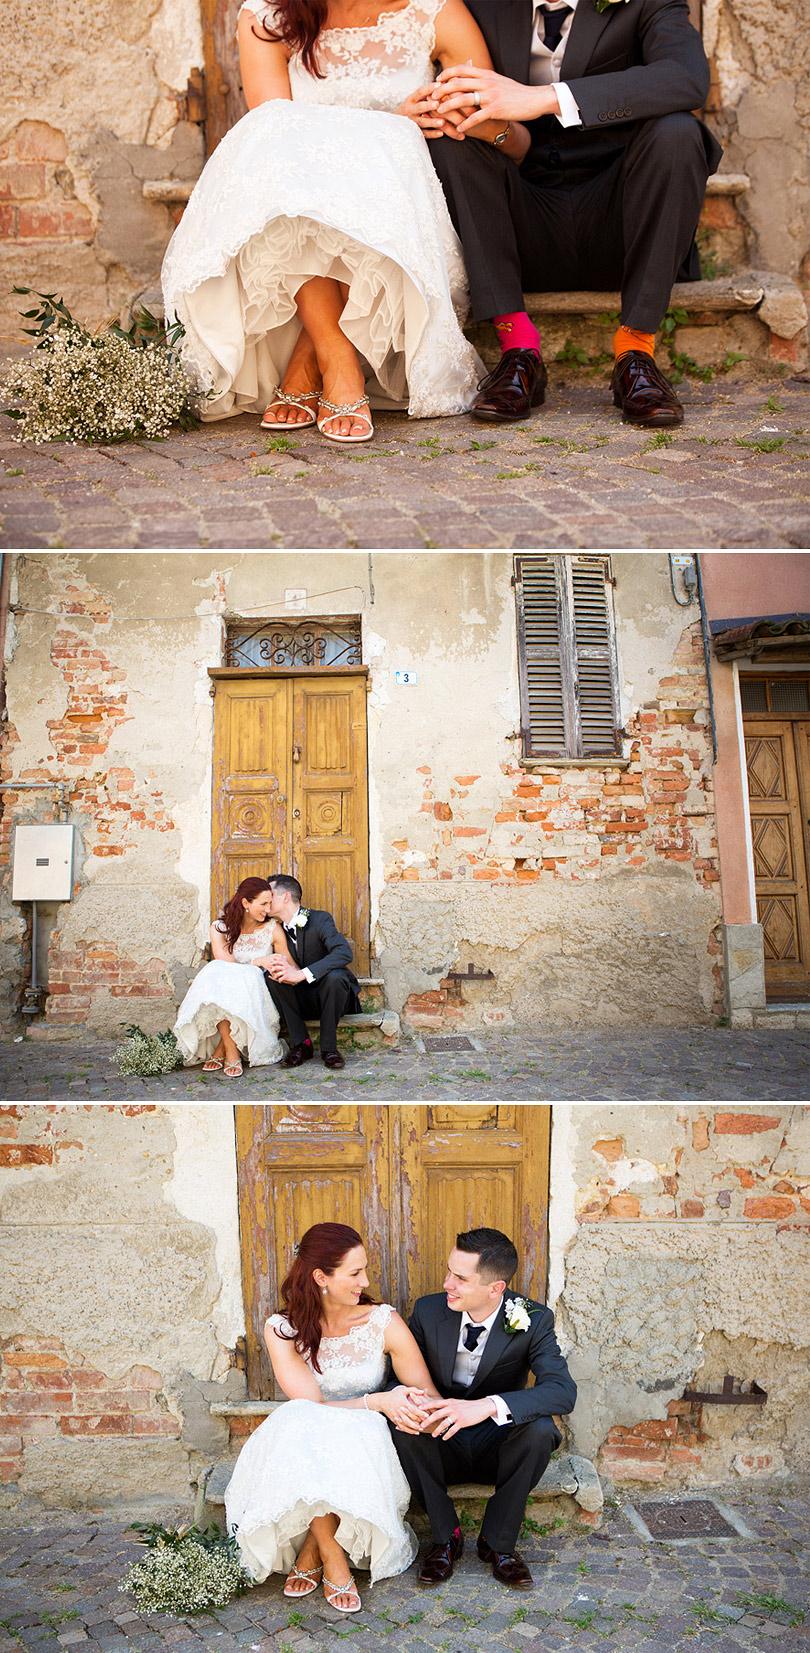 Castello-di-Cortanze-Italian-Wedding-LilyandFrankPhotography_18.jpg